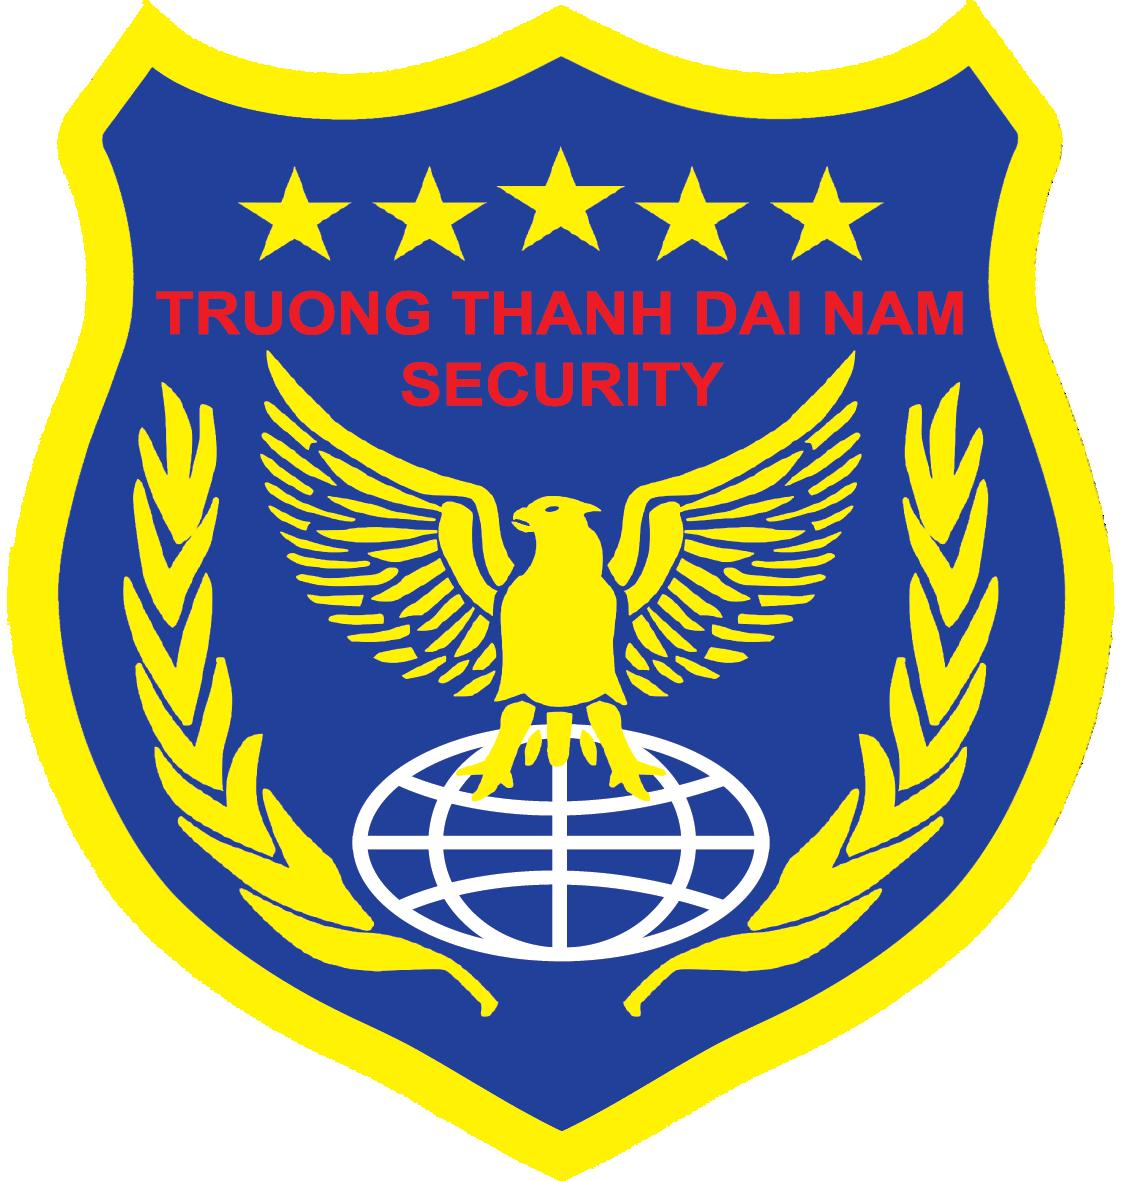 cong-ty-tnhh-dvbv-truong-thanh-dai-nam-security